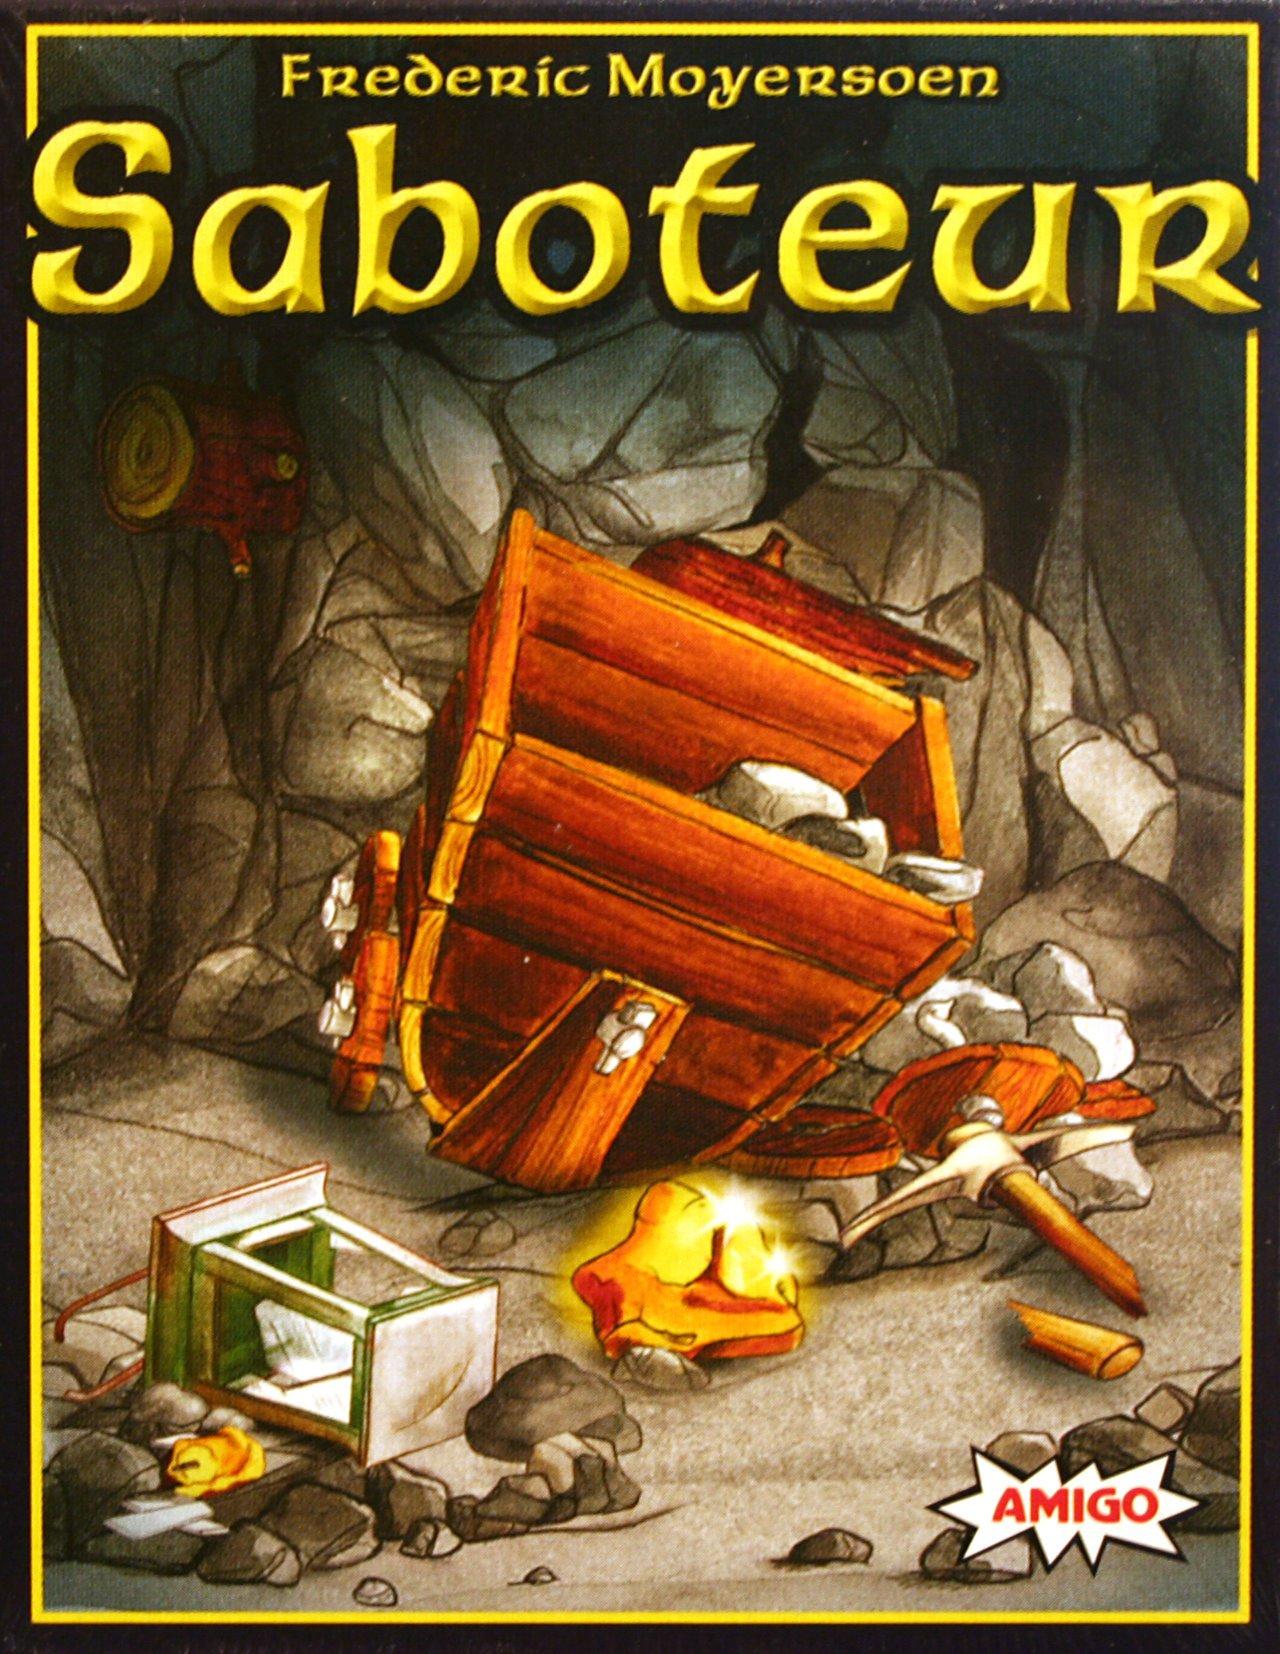 Saboteur gioco da tavolo gdt tana dei goblin - Blokus gioco da tavolo ...